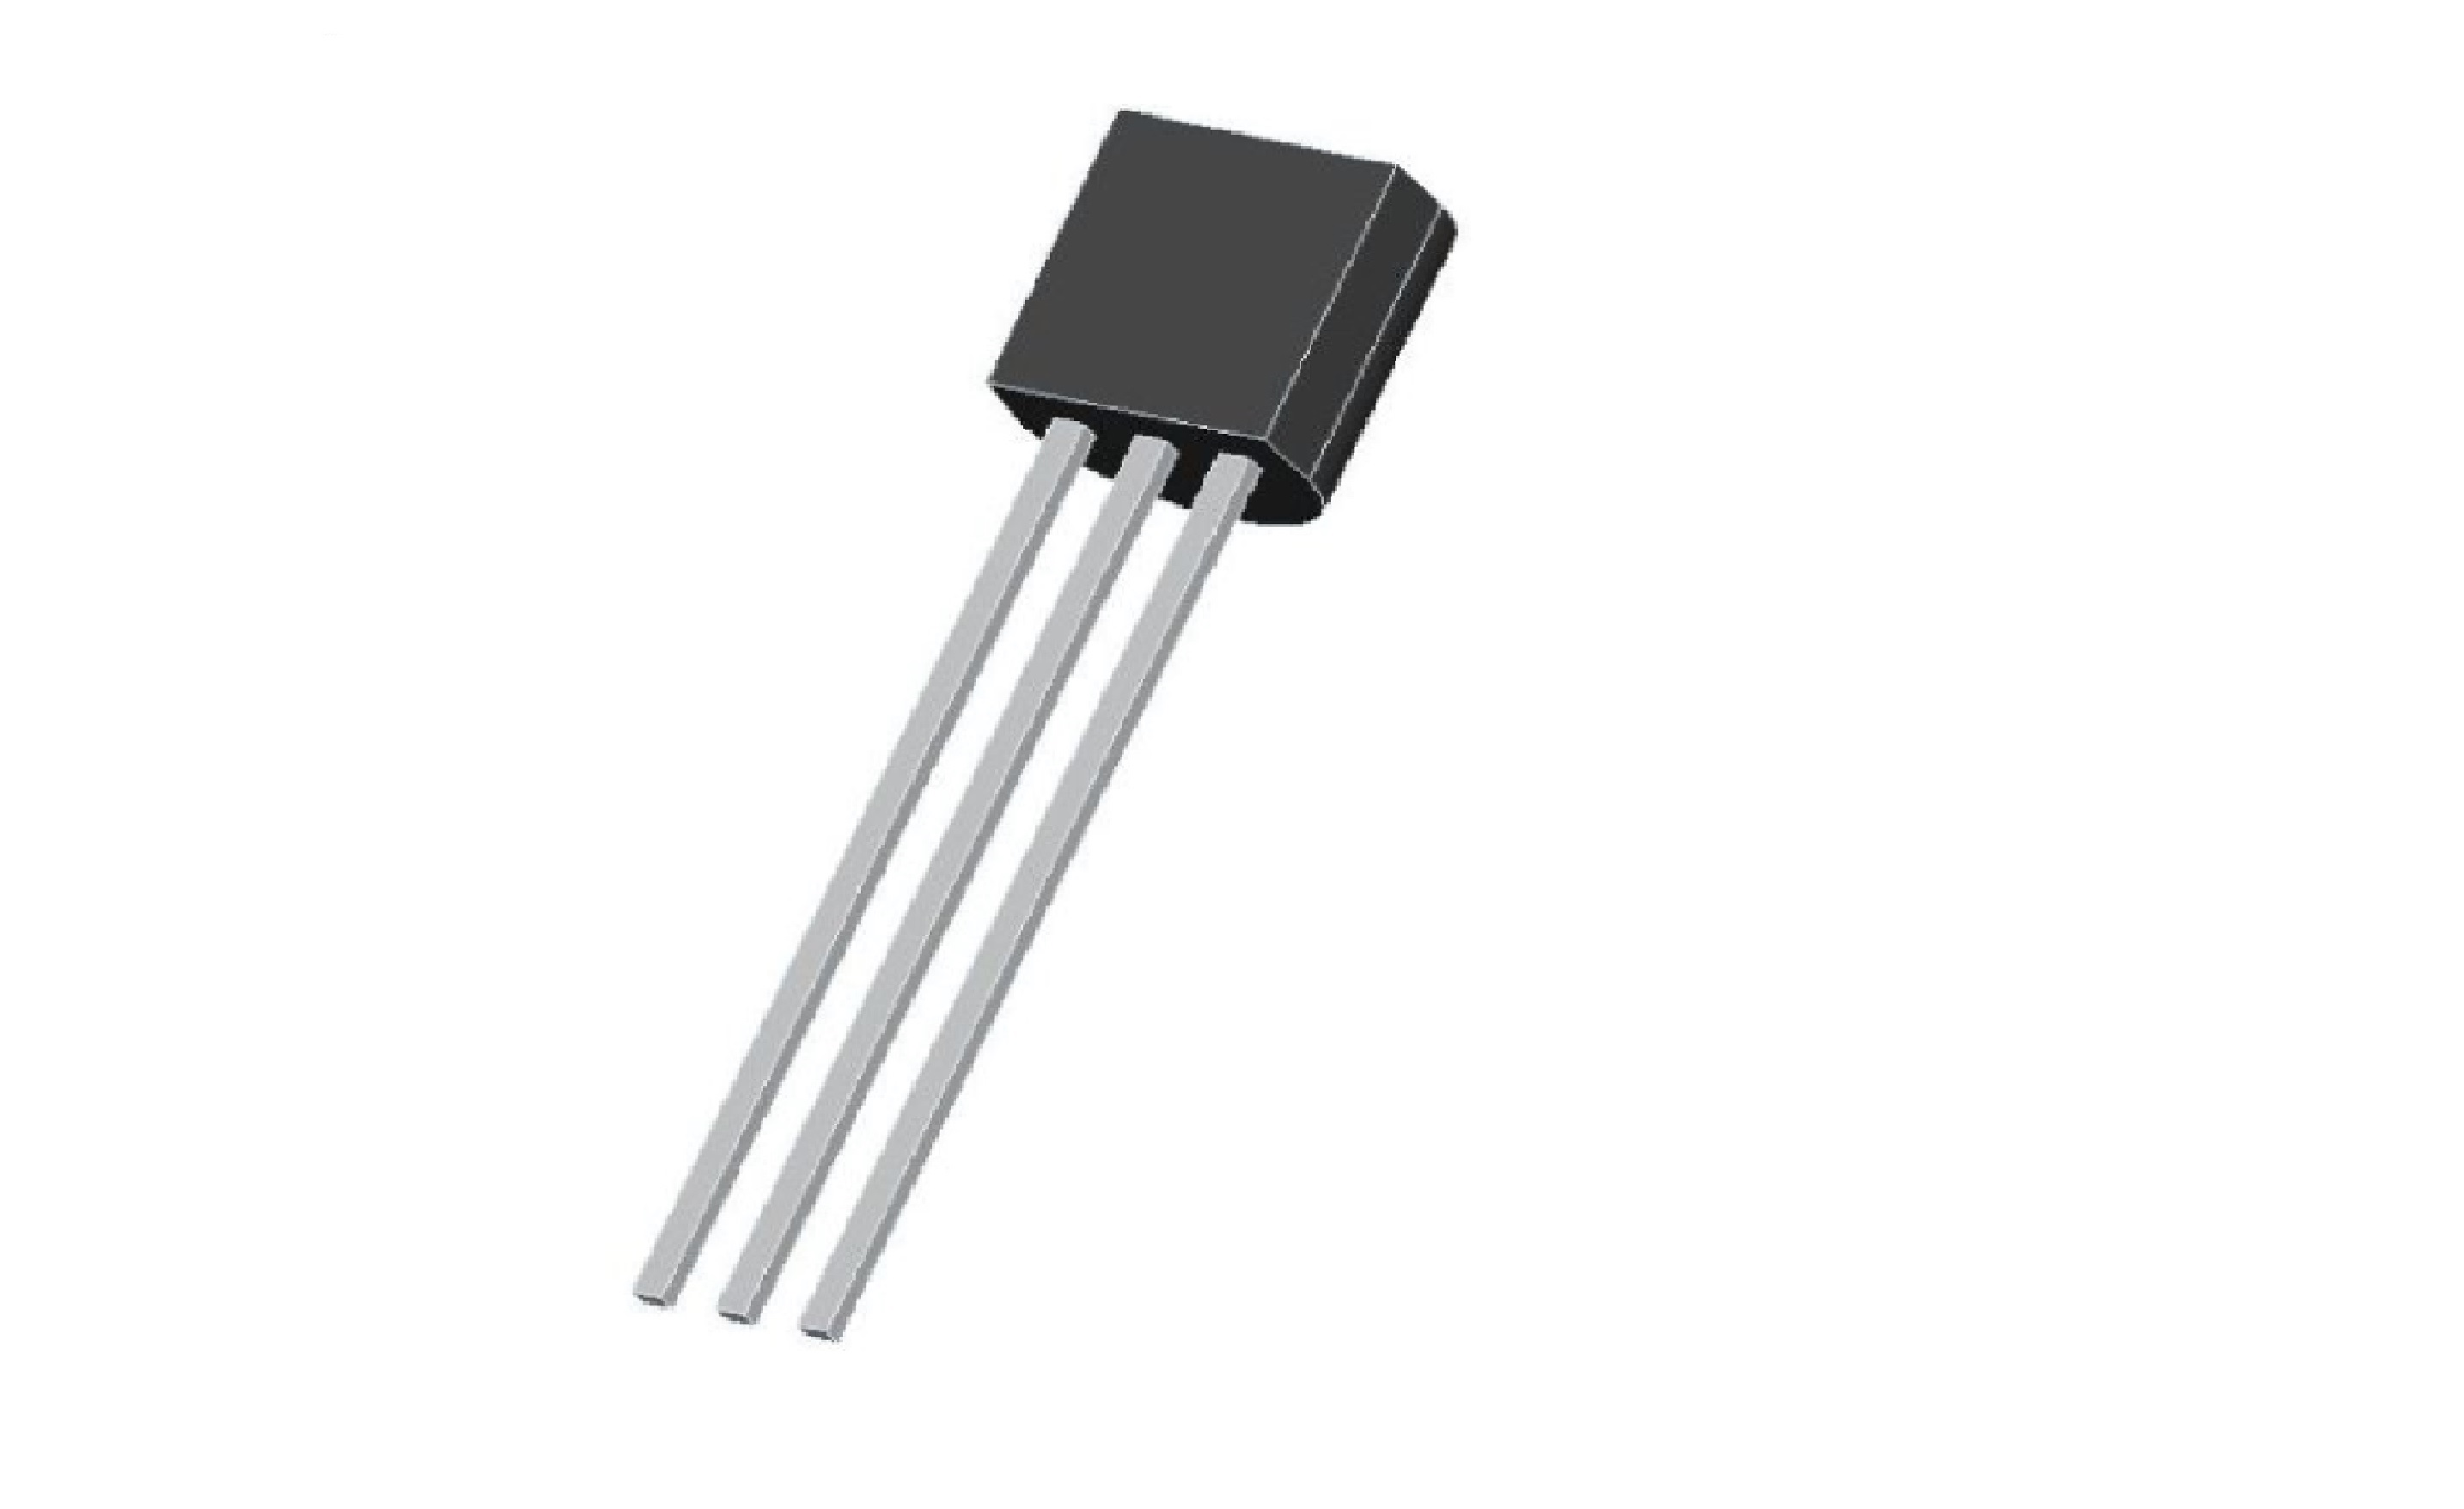 Fairchild Semi Taitron Internet Super Store Tiss Lm337lz Voltage Regulator Integrated Circuit To92 Packing Method Ammo Pack Status Full Box 2000 Rohs N Description 5v 4 At 25c 100ma 30v Vdo17v In To 92